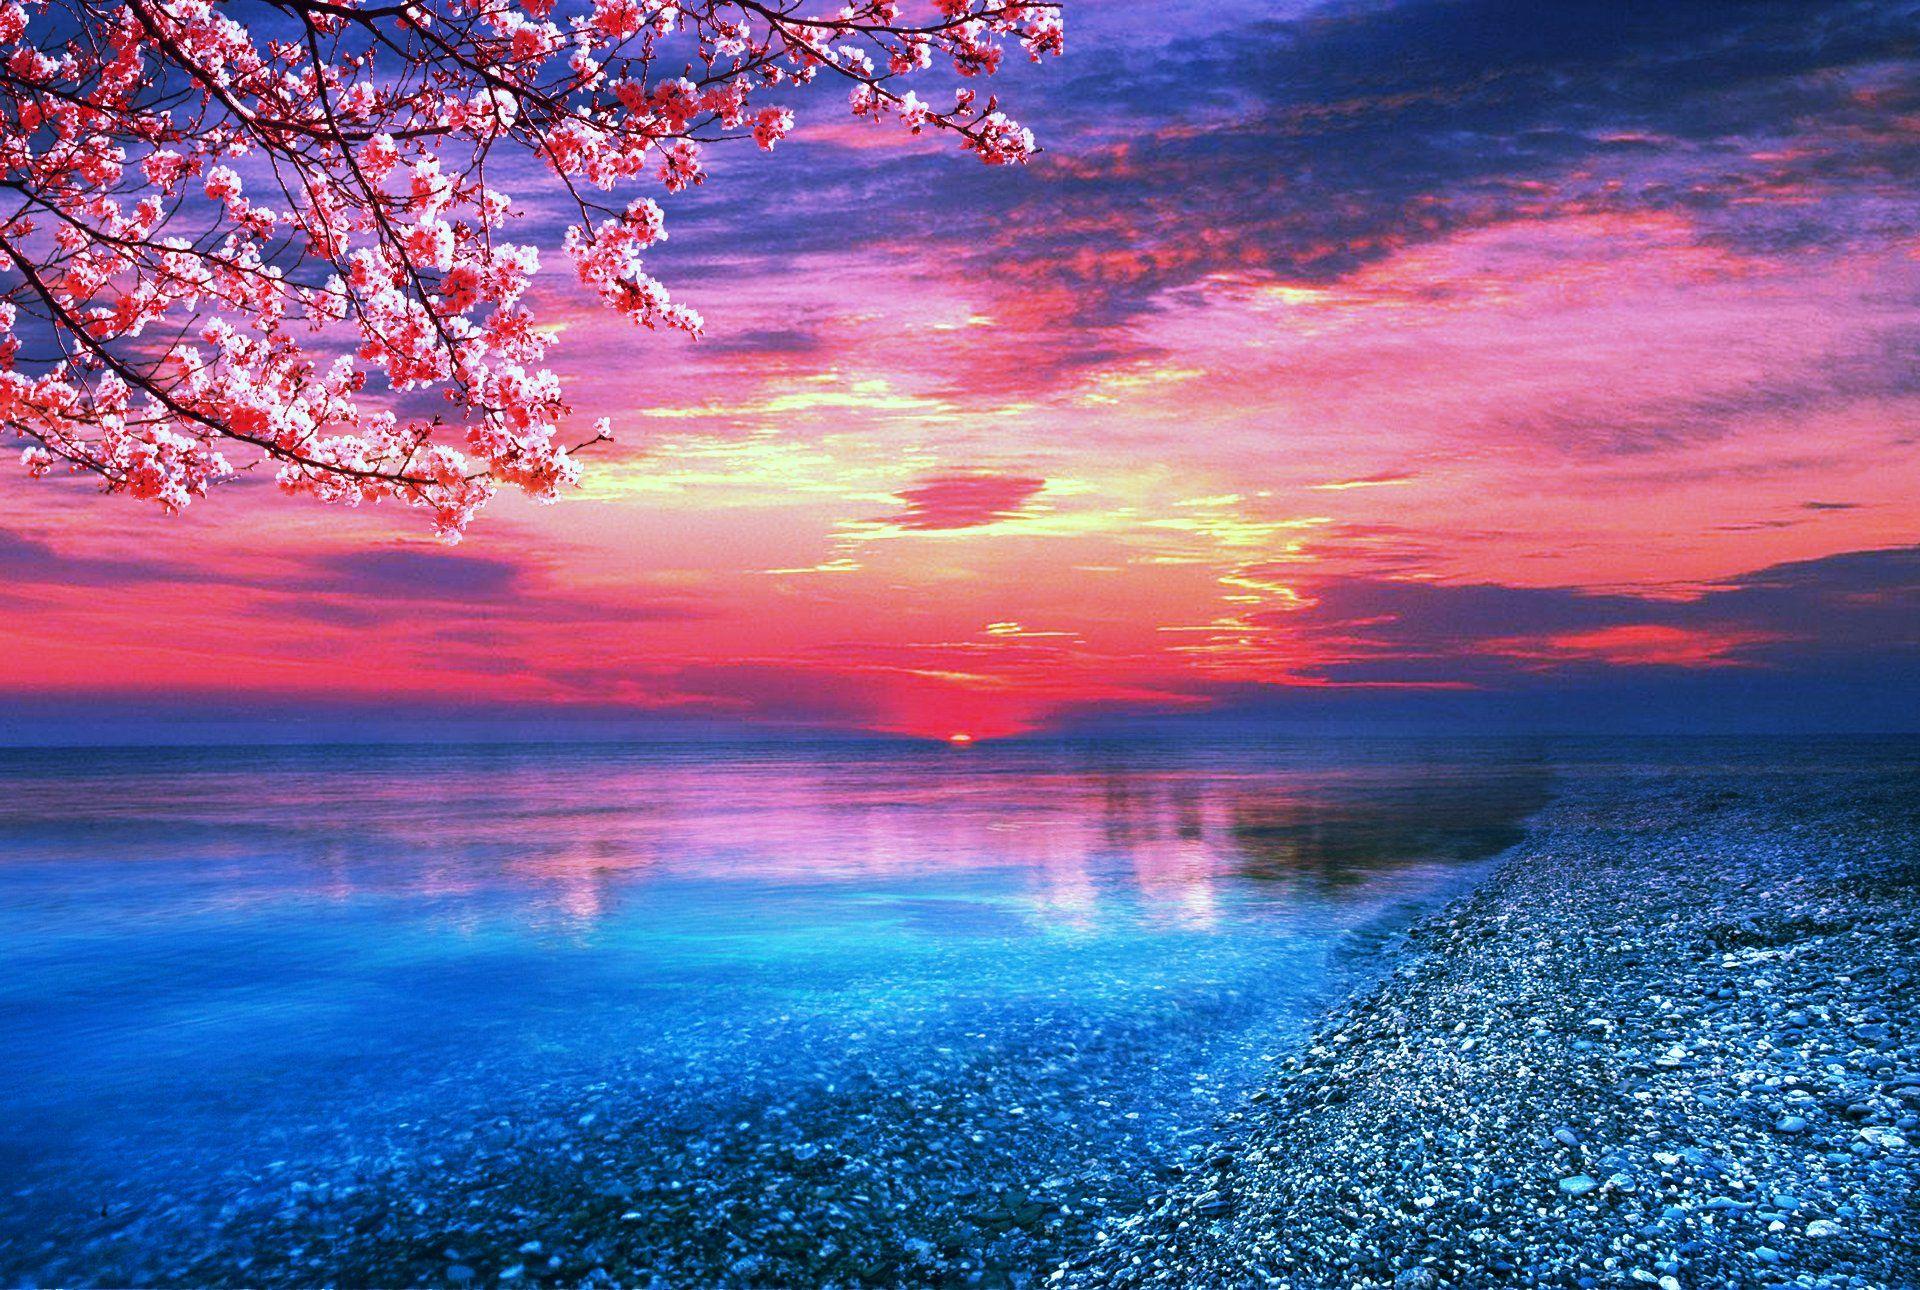 Looks so much like a painting in Japan 🌸 Ocean wallpaper